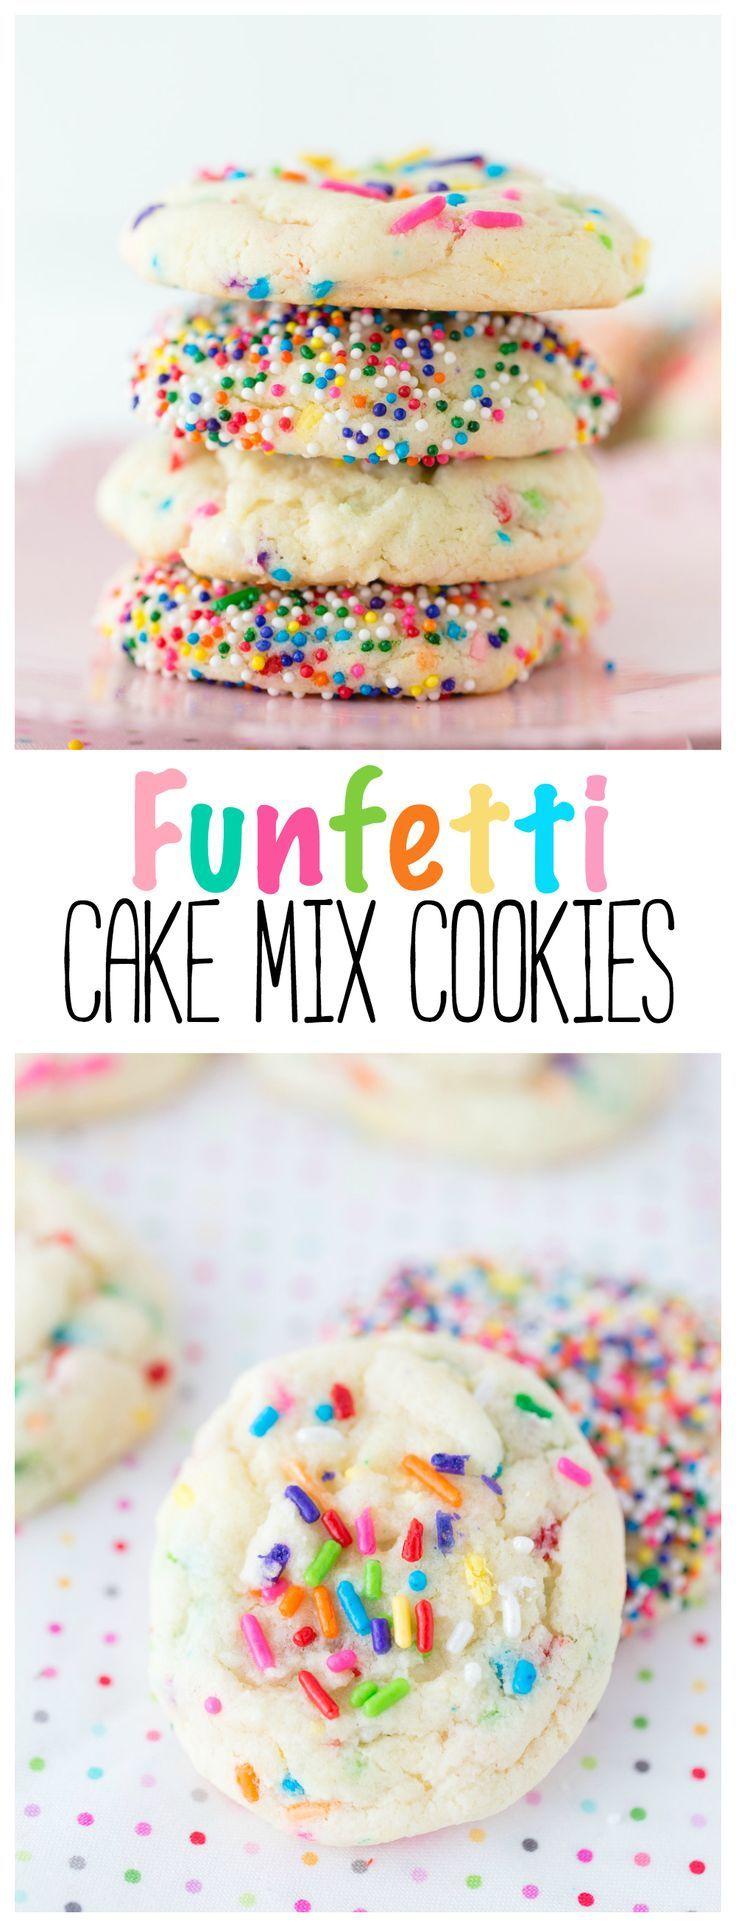 Funfetti Cake Mix Cookies   Cookies   Cake Mix Recipe   Cake Mix  